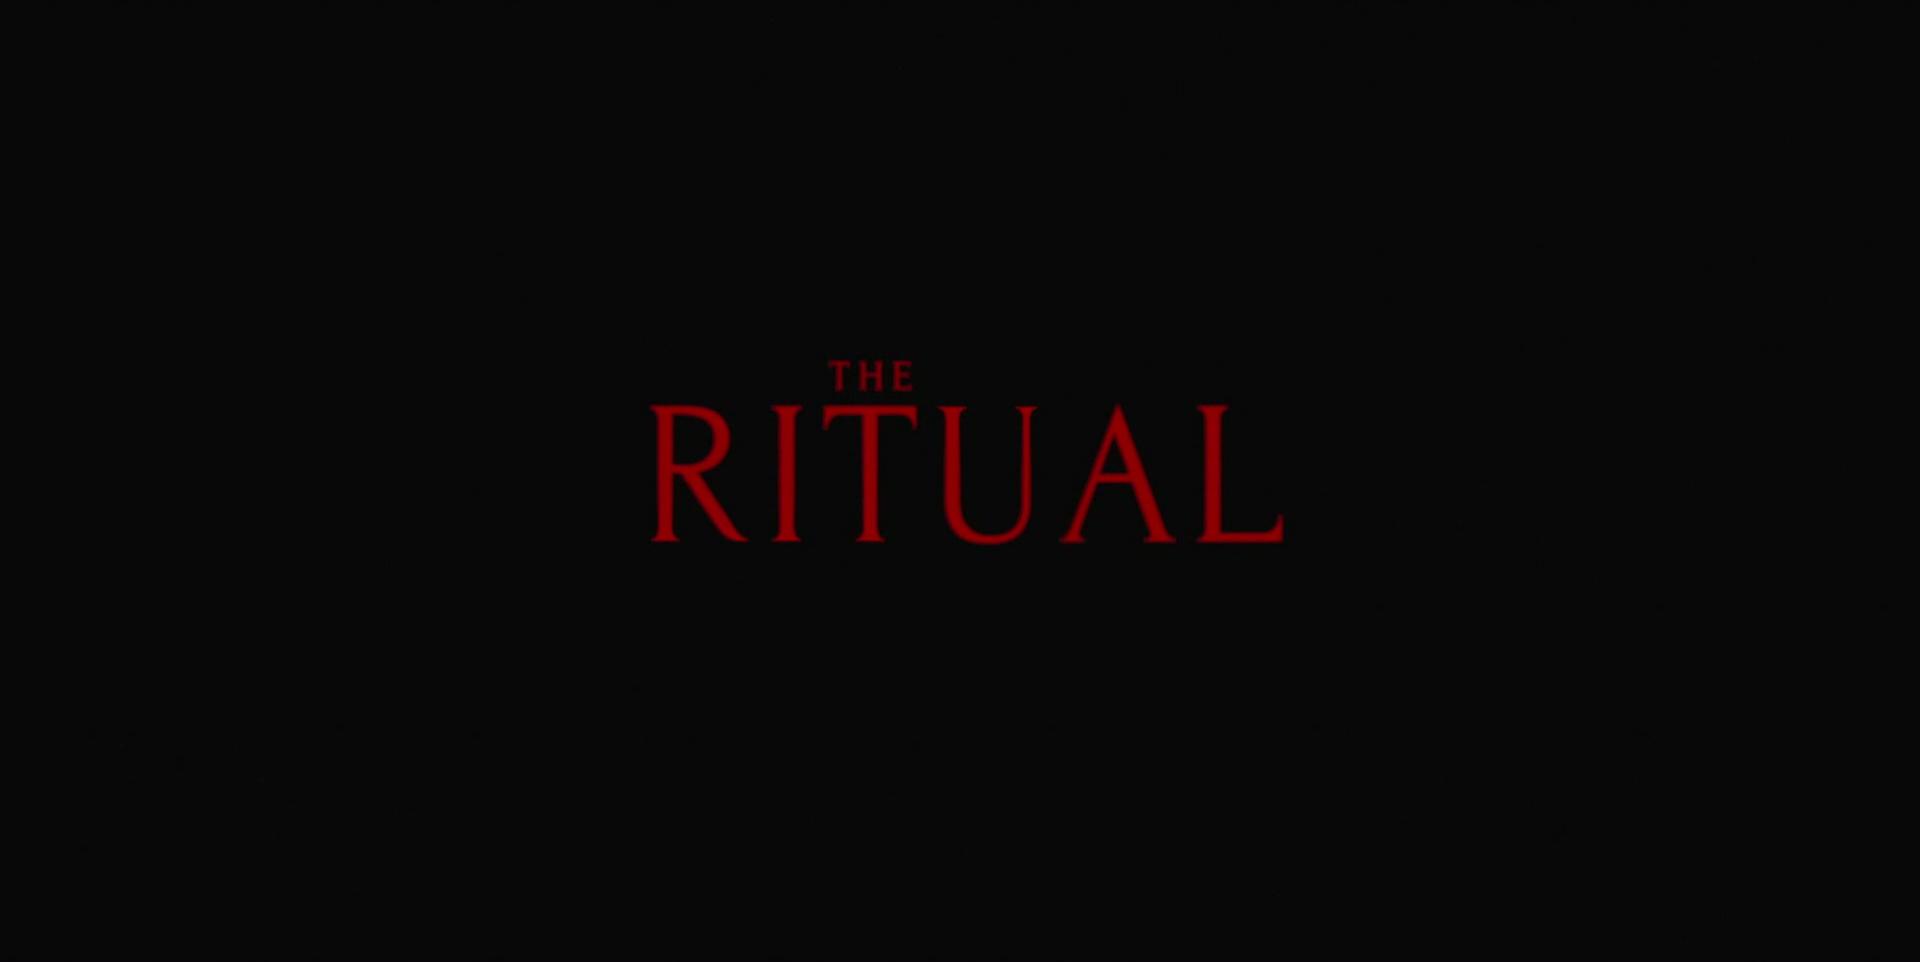 LE RITUEL (The Ritual) de David Bruckner (2017)